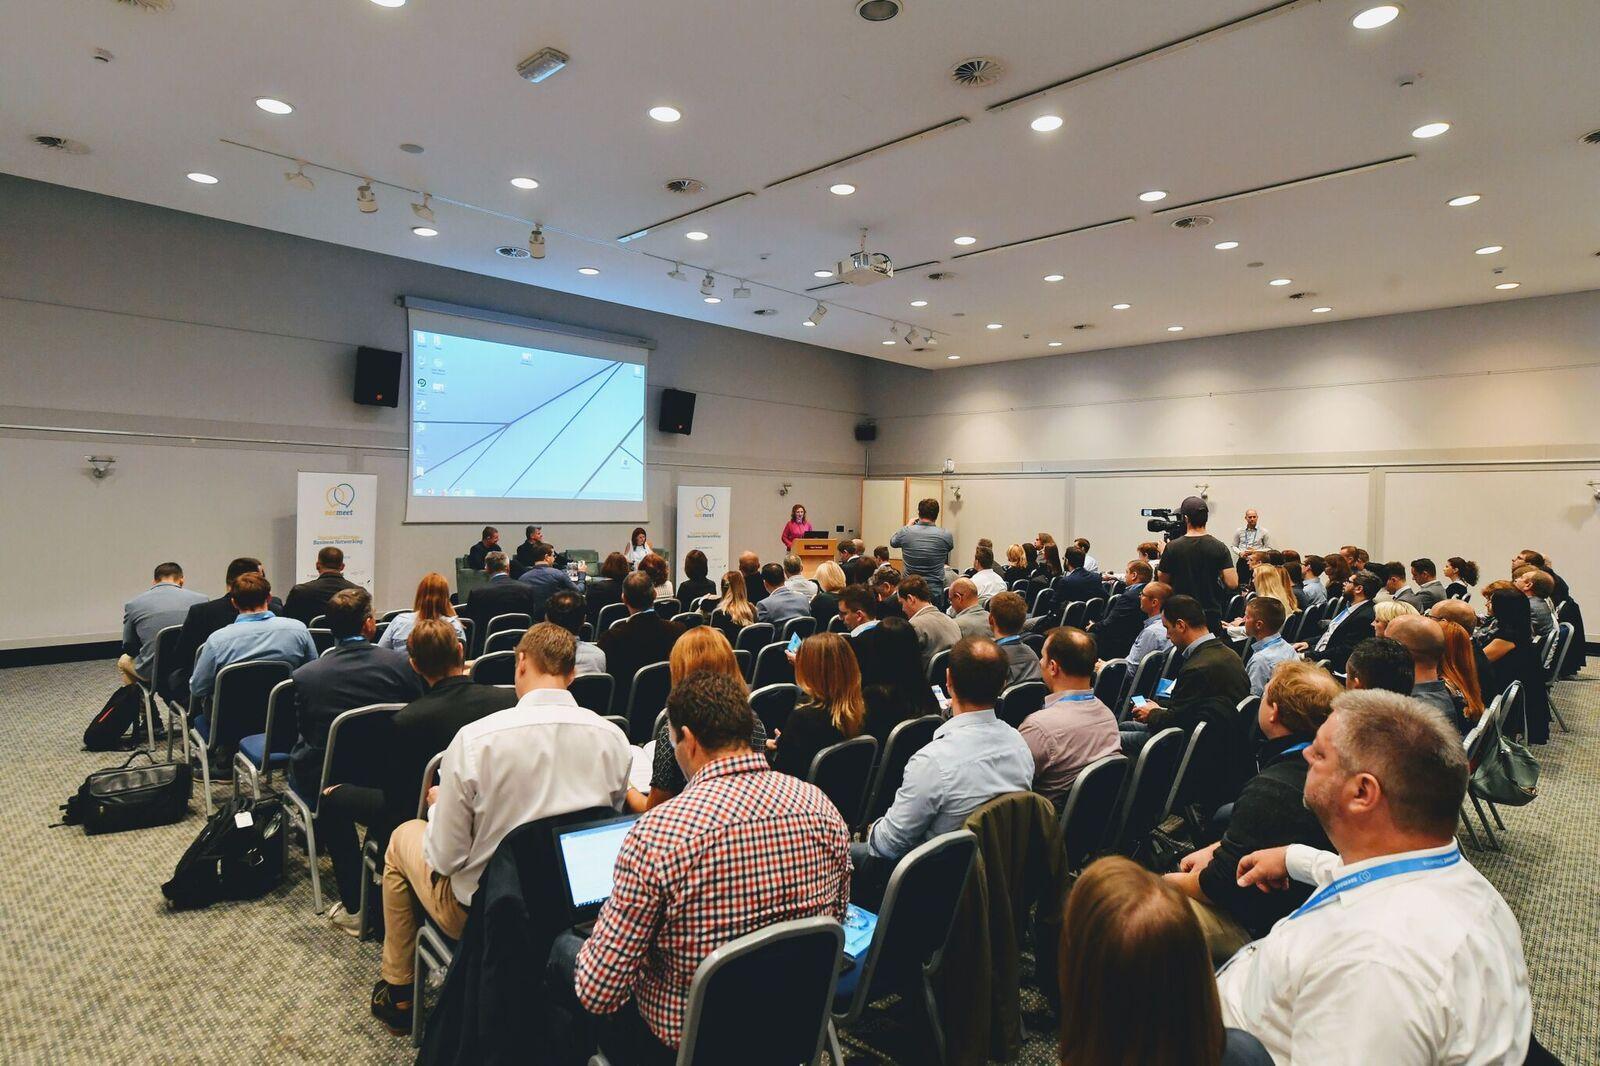 maribor_seemeet_conference